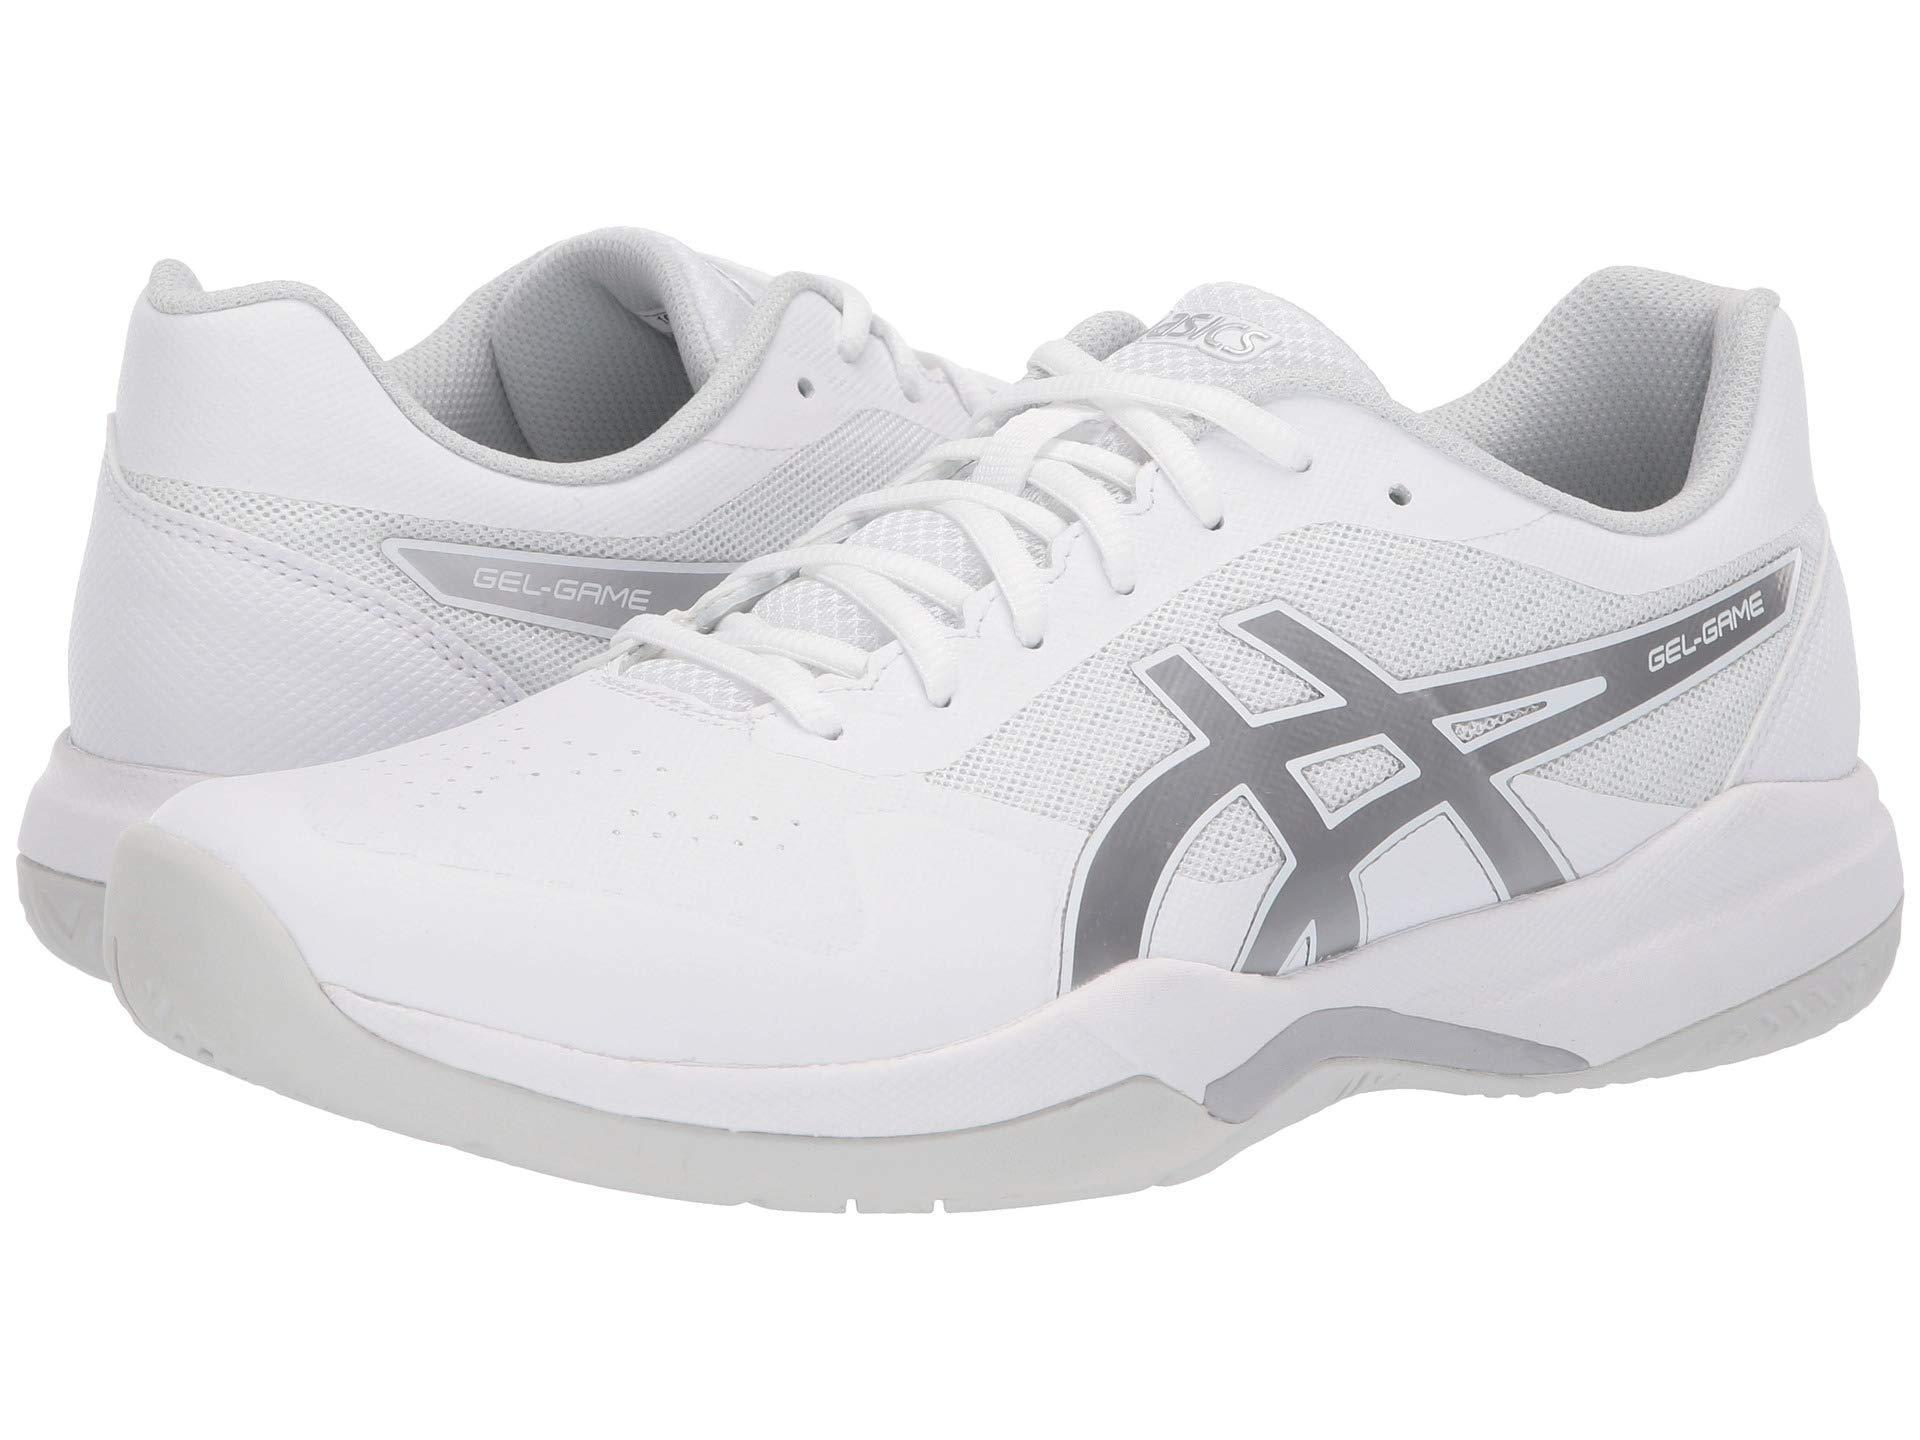 finest selection 3135e 3cea1 Asics. White Gel-game 7 (black cherry Tomato) Men s Tennis Shoes